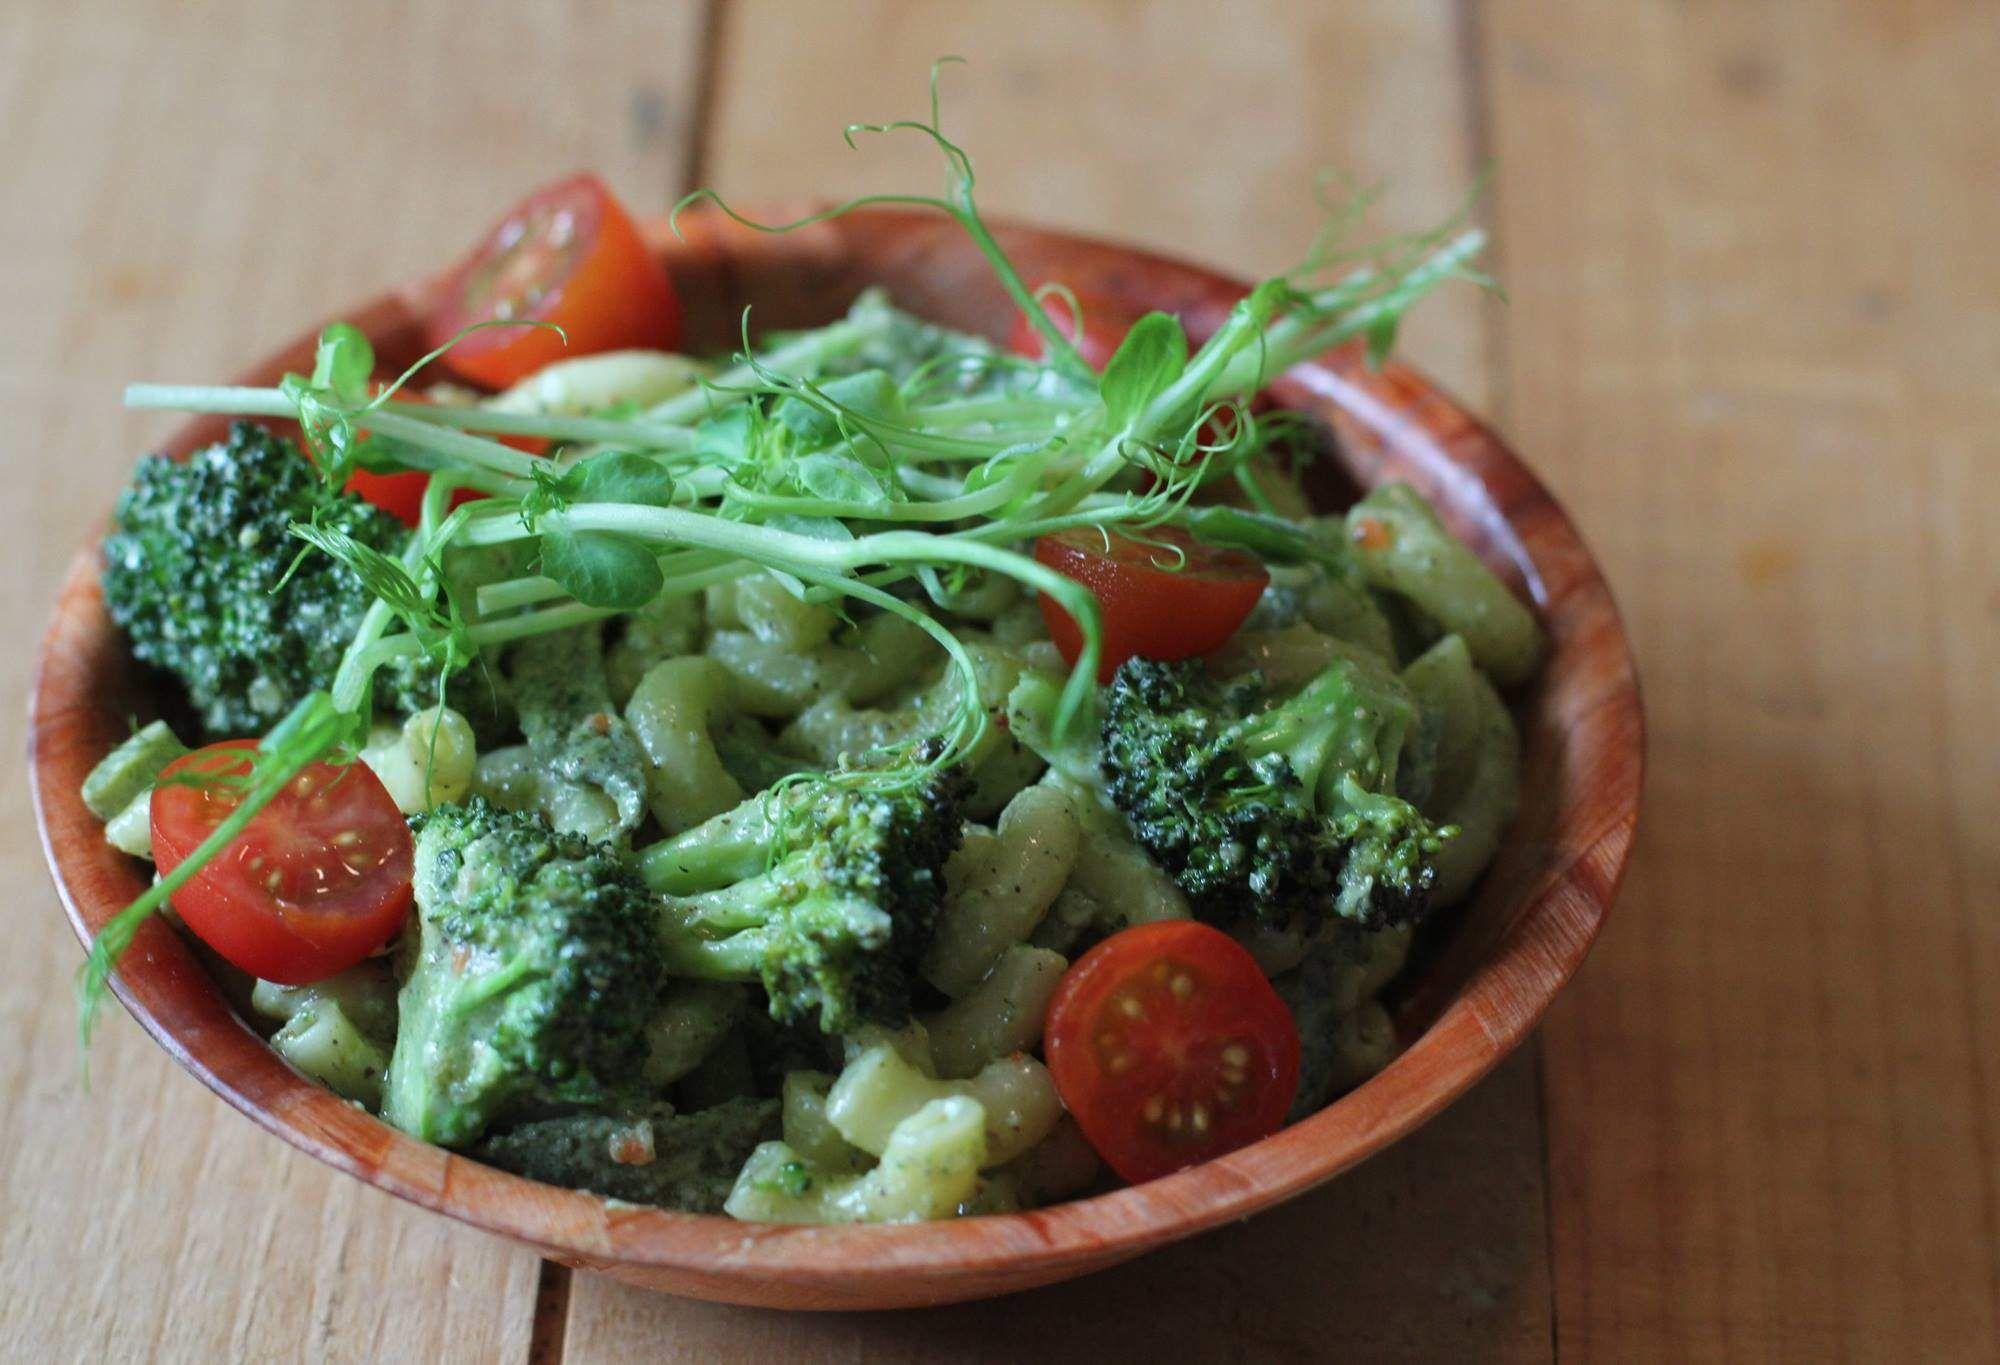 Vegan And Vegetarian Restaurants On Oahu That We Love